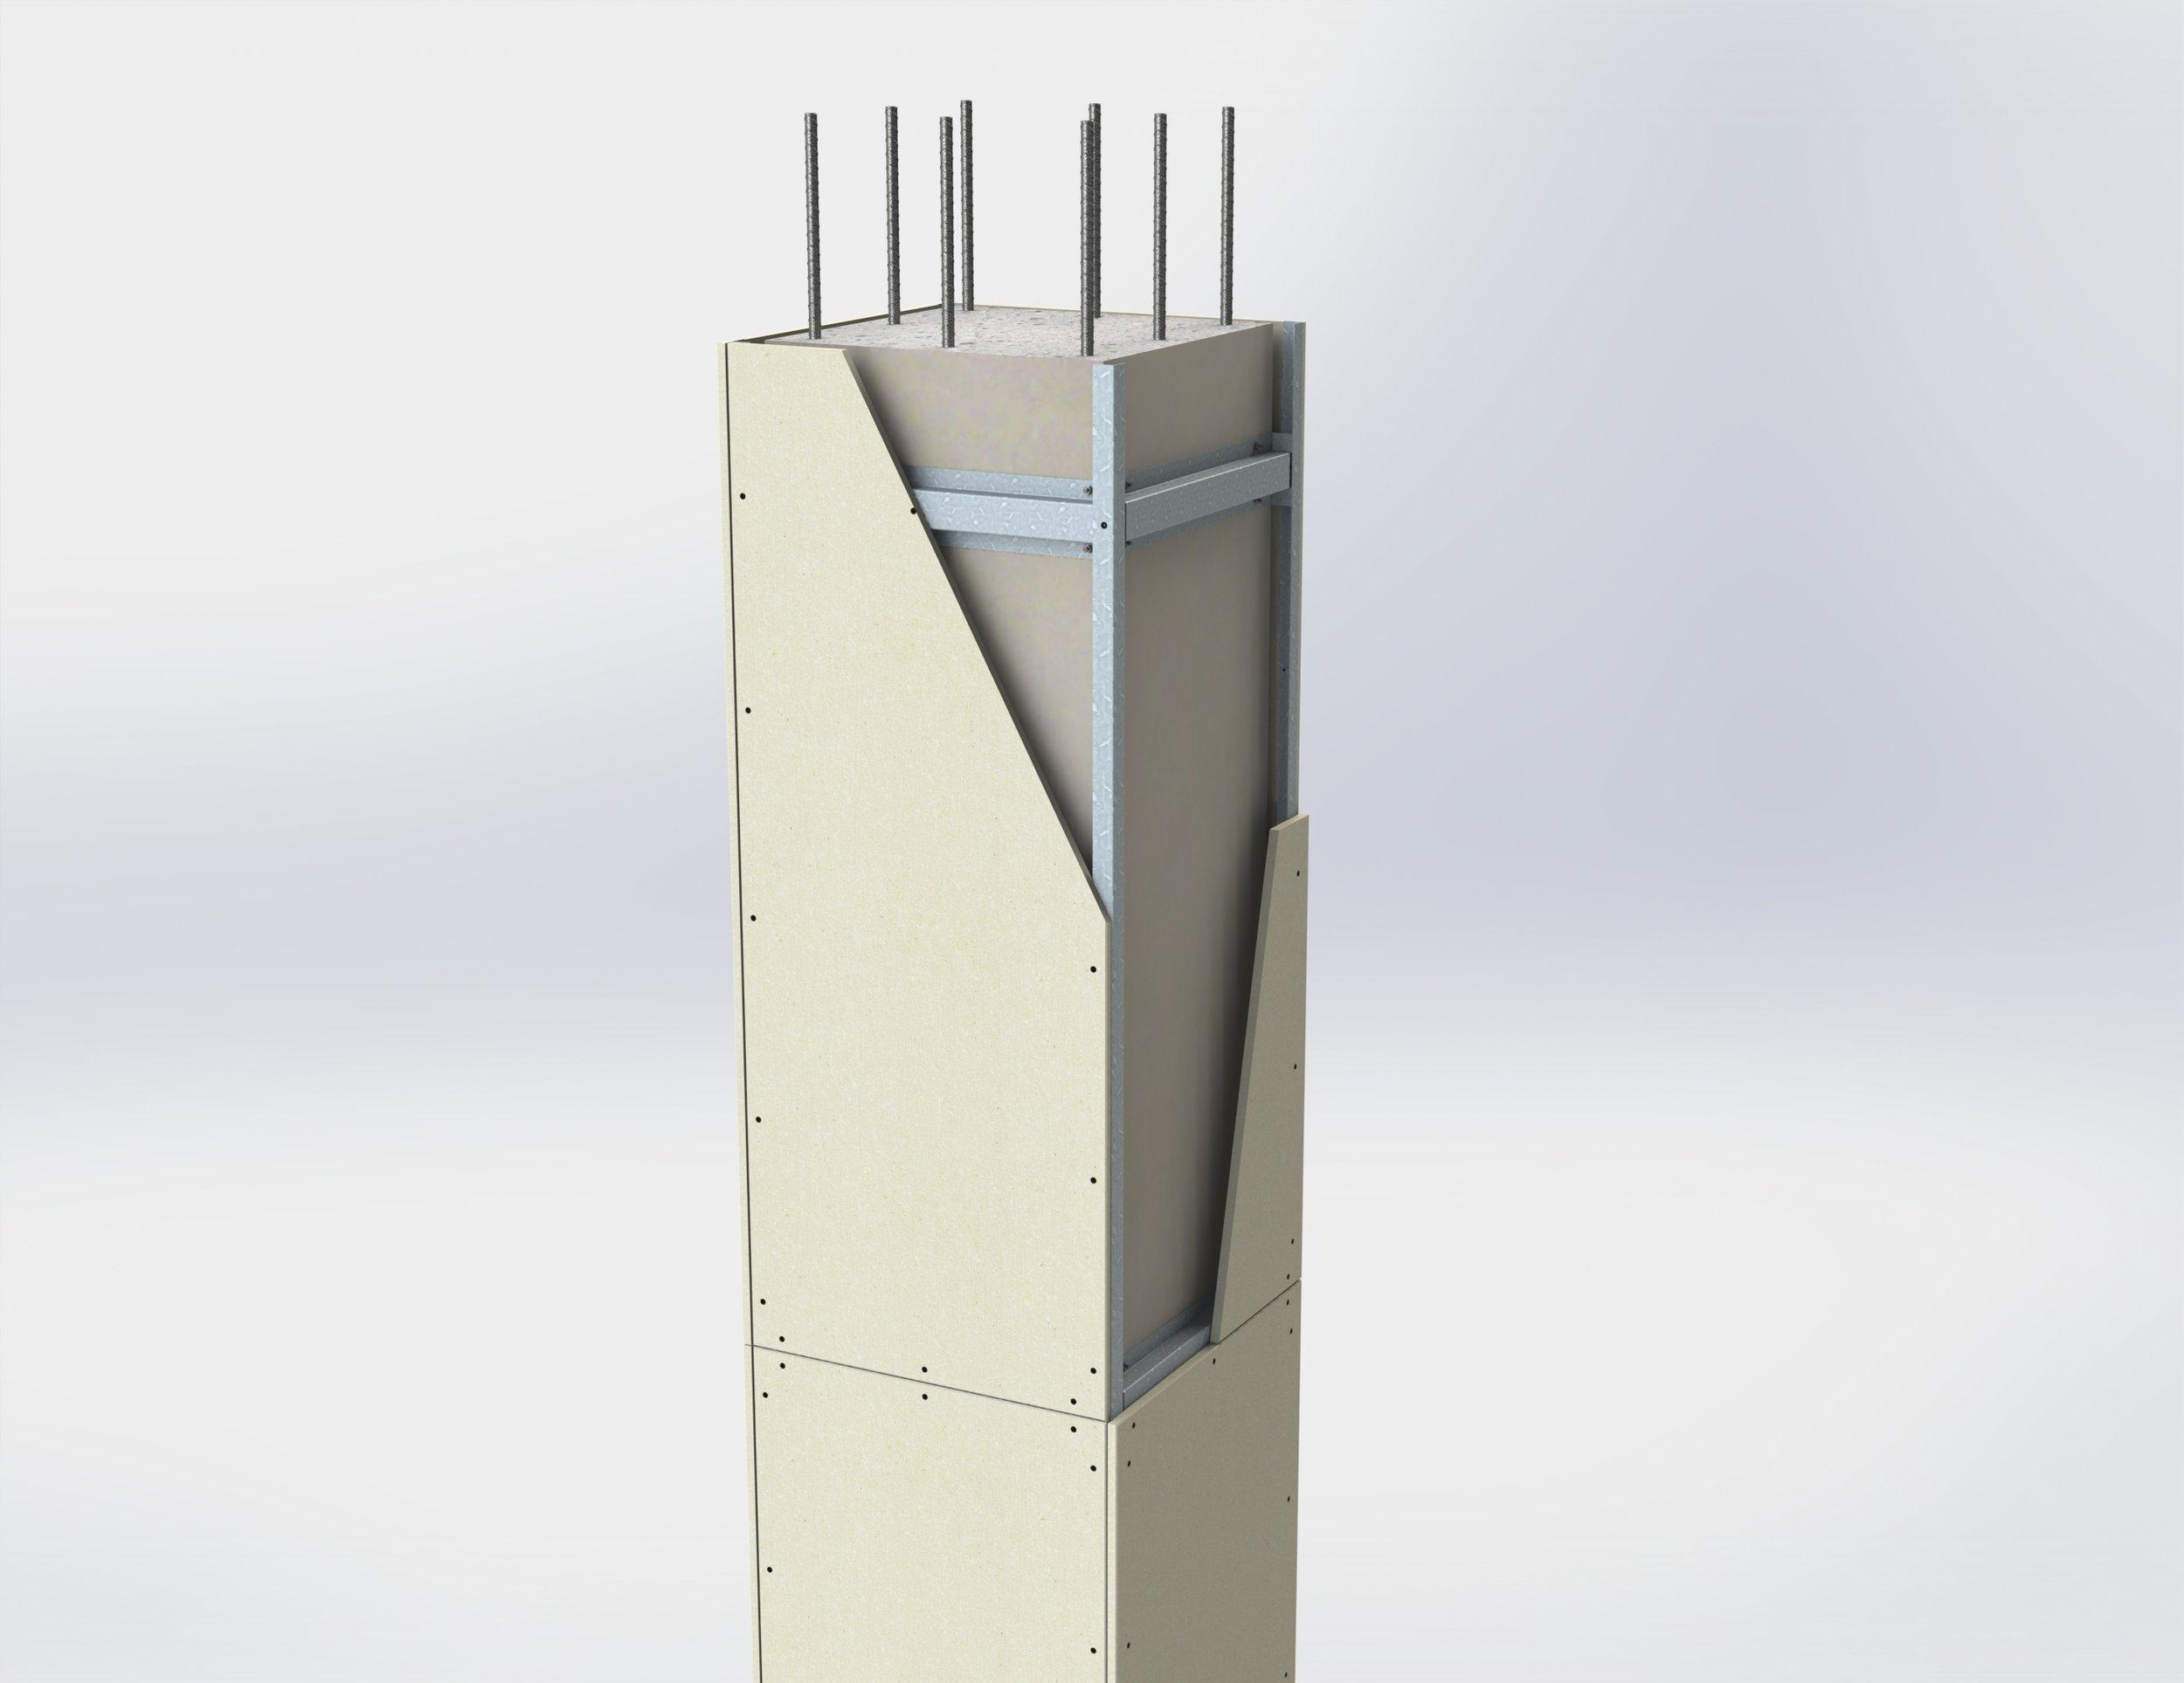 Concrete Structures Upgrade